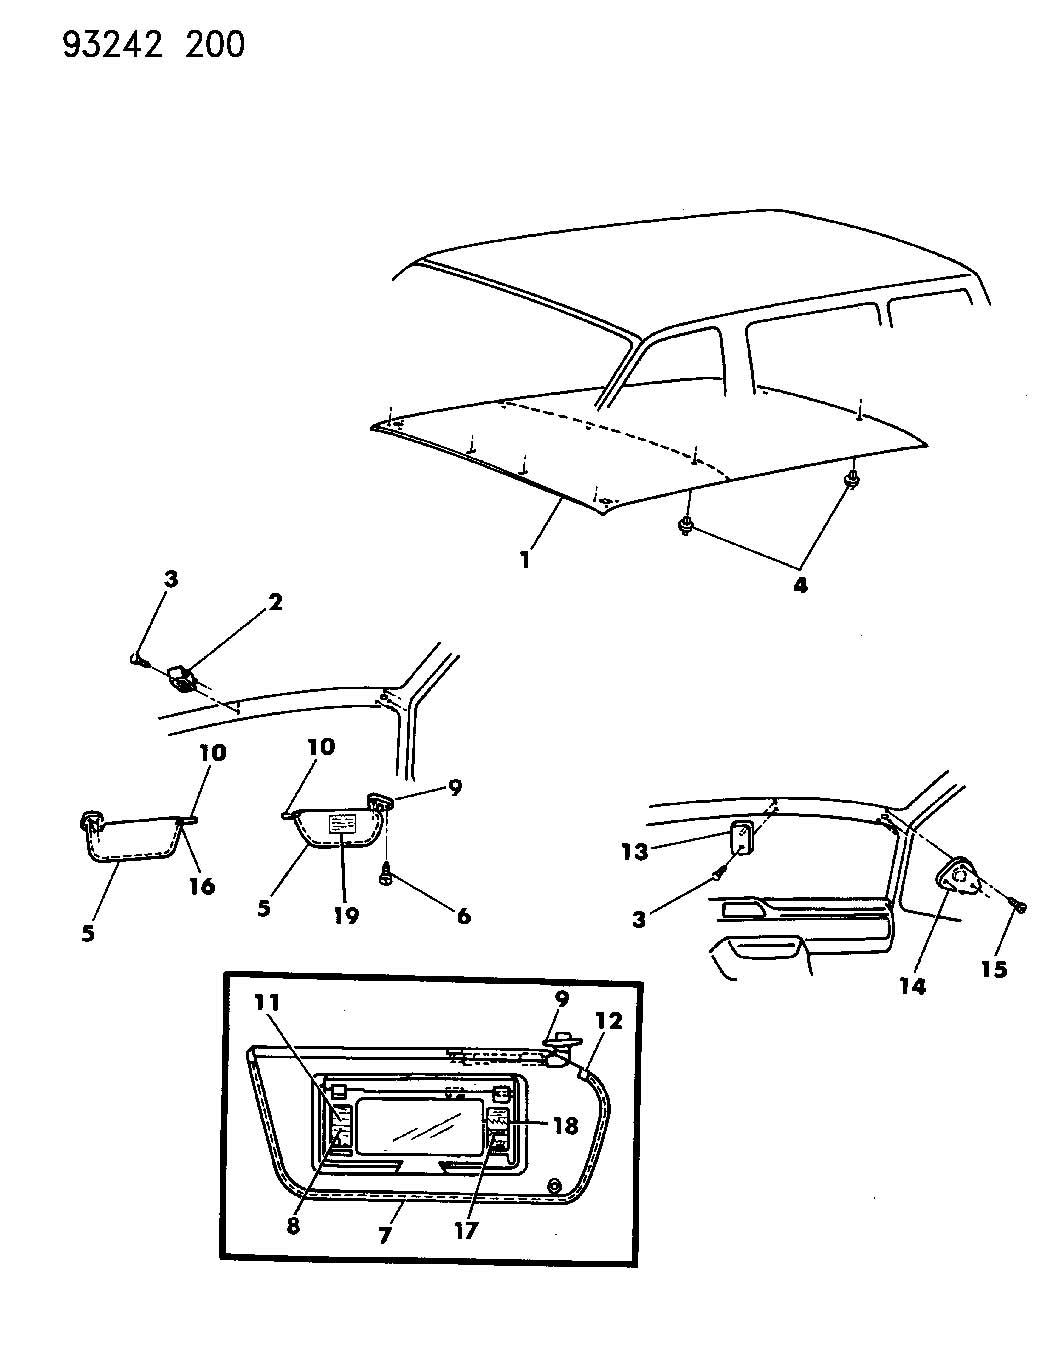 2005 Dodge Caravan Parts Diagram, 2005, Get Free Image